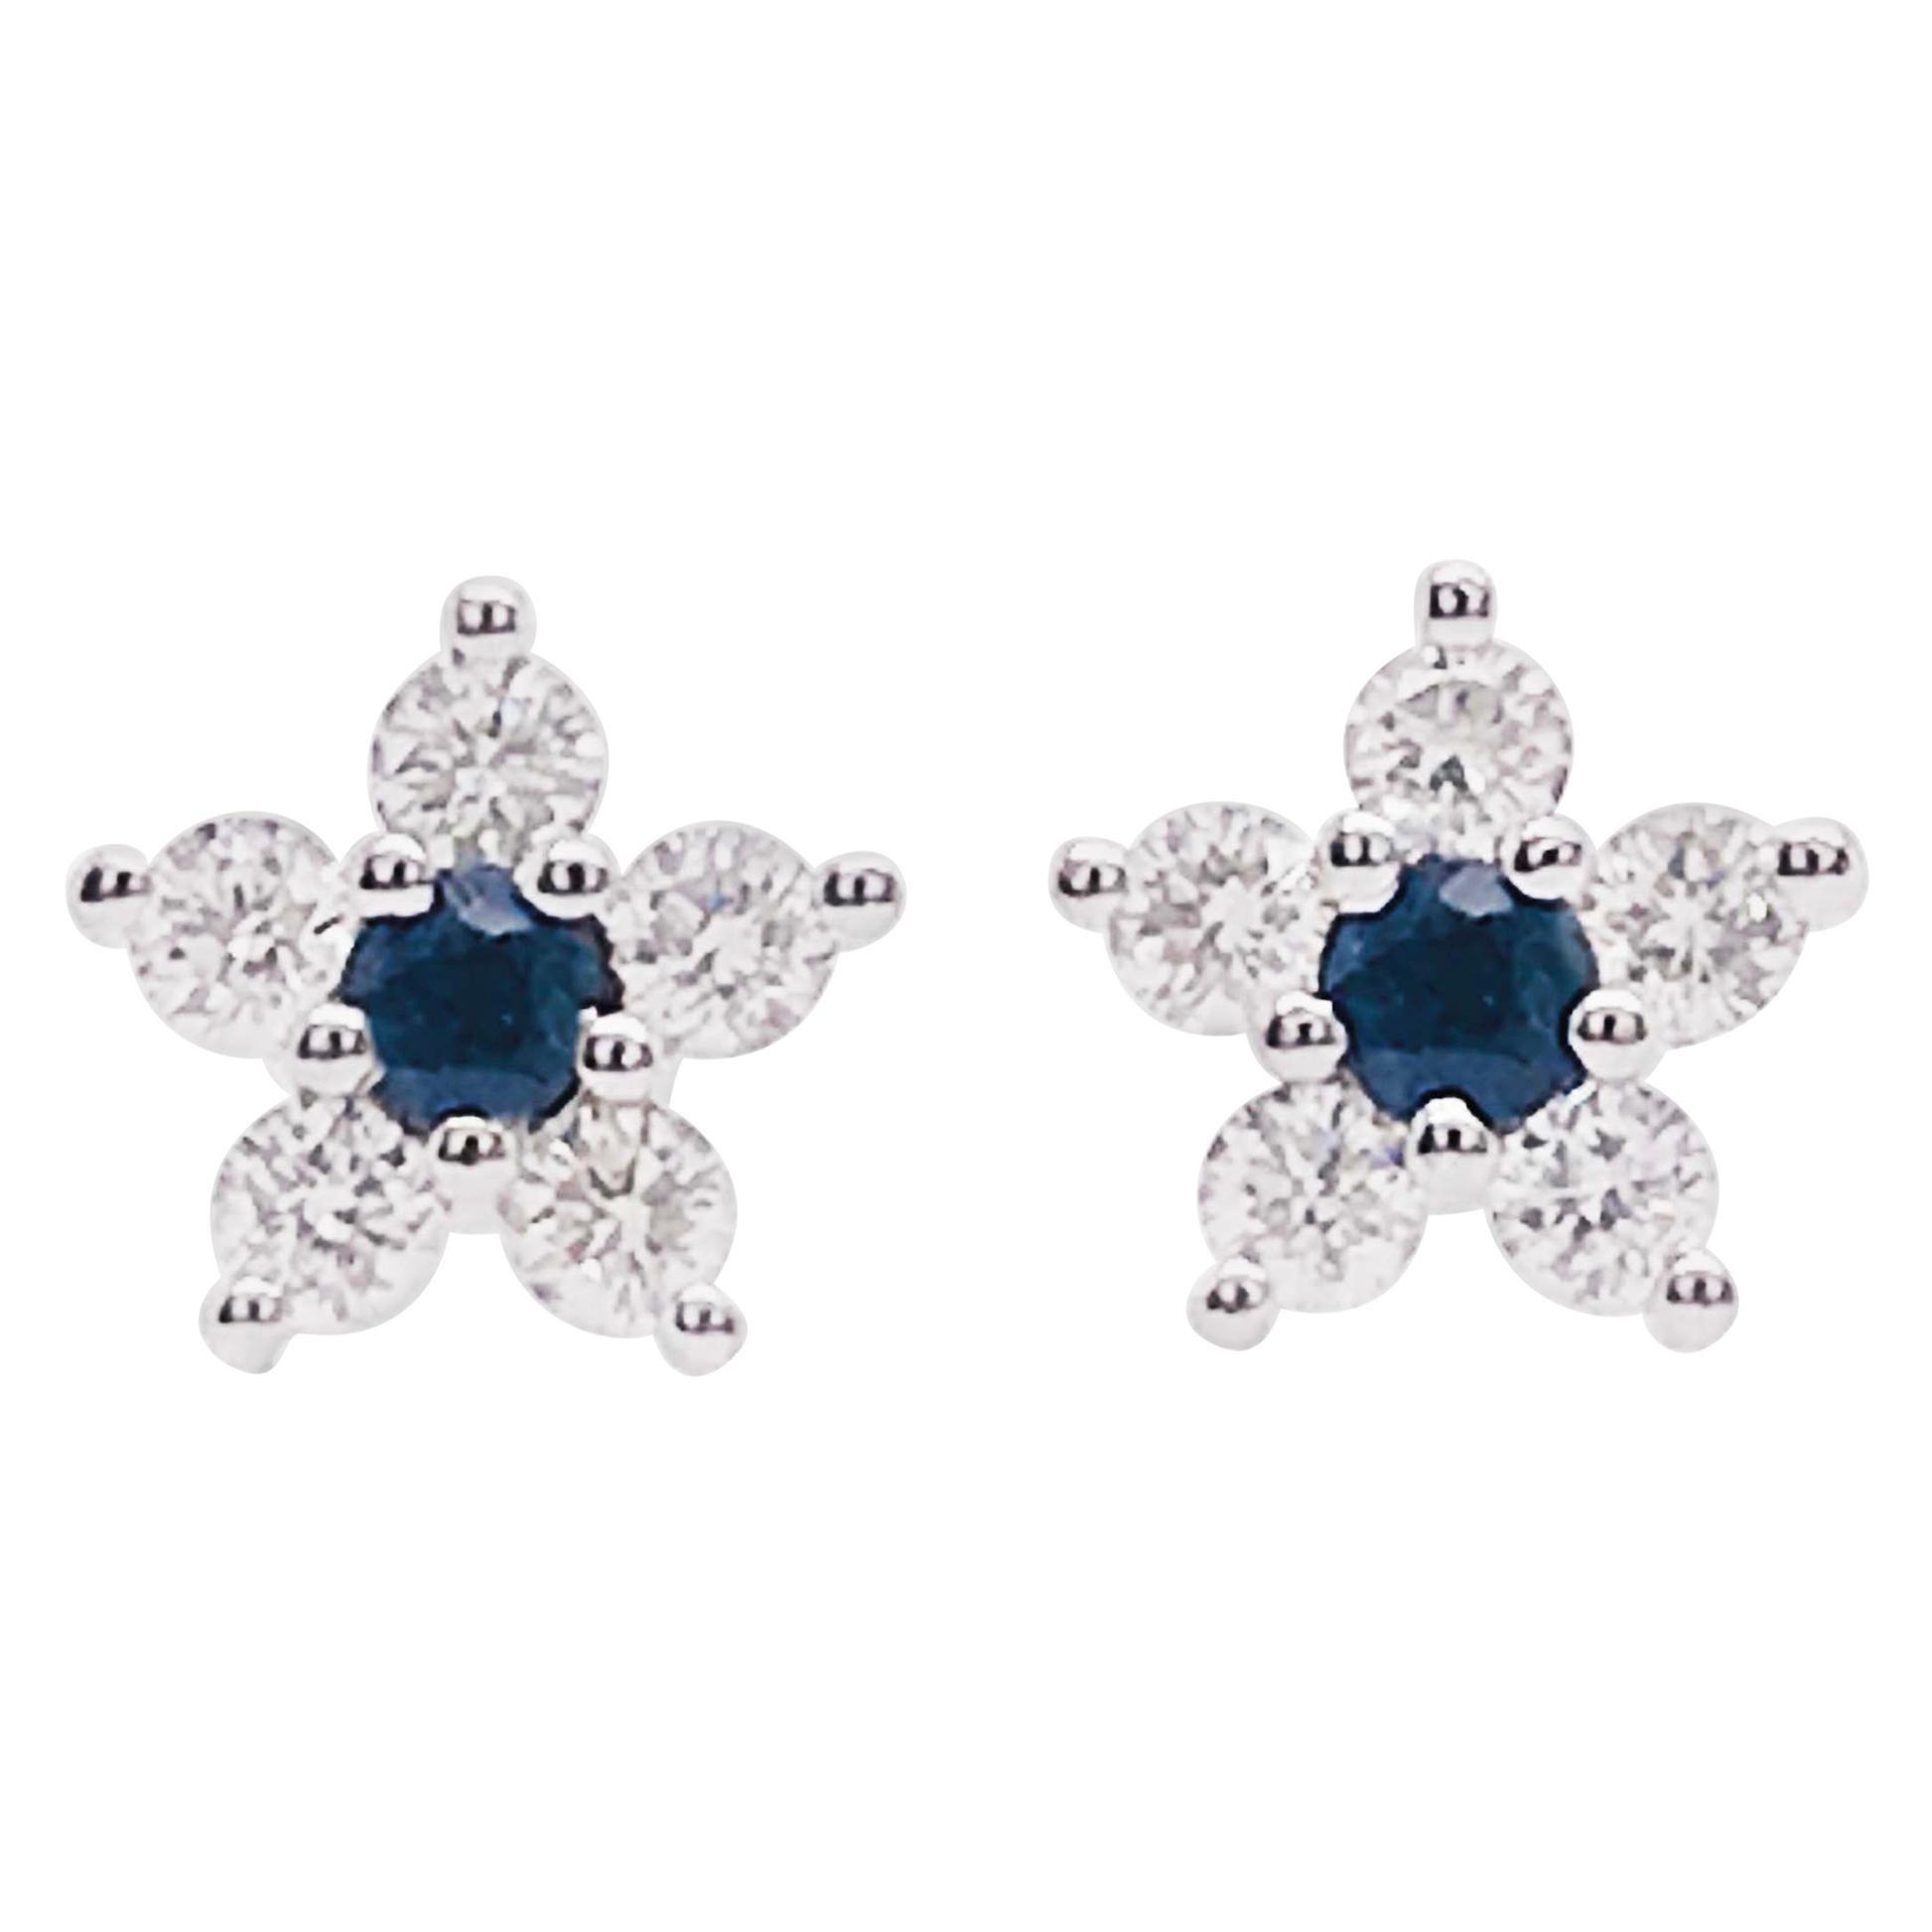 Sapphire and Diamond Flower Earrings, Blue Sapphire and Diamond Dainty Stud Ear